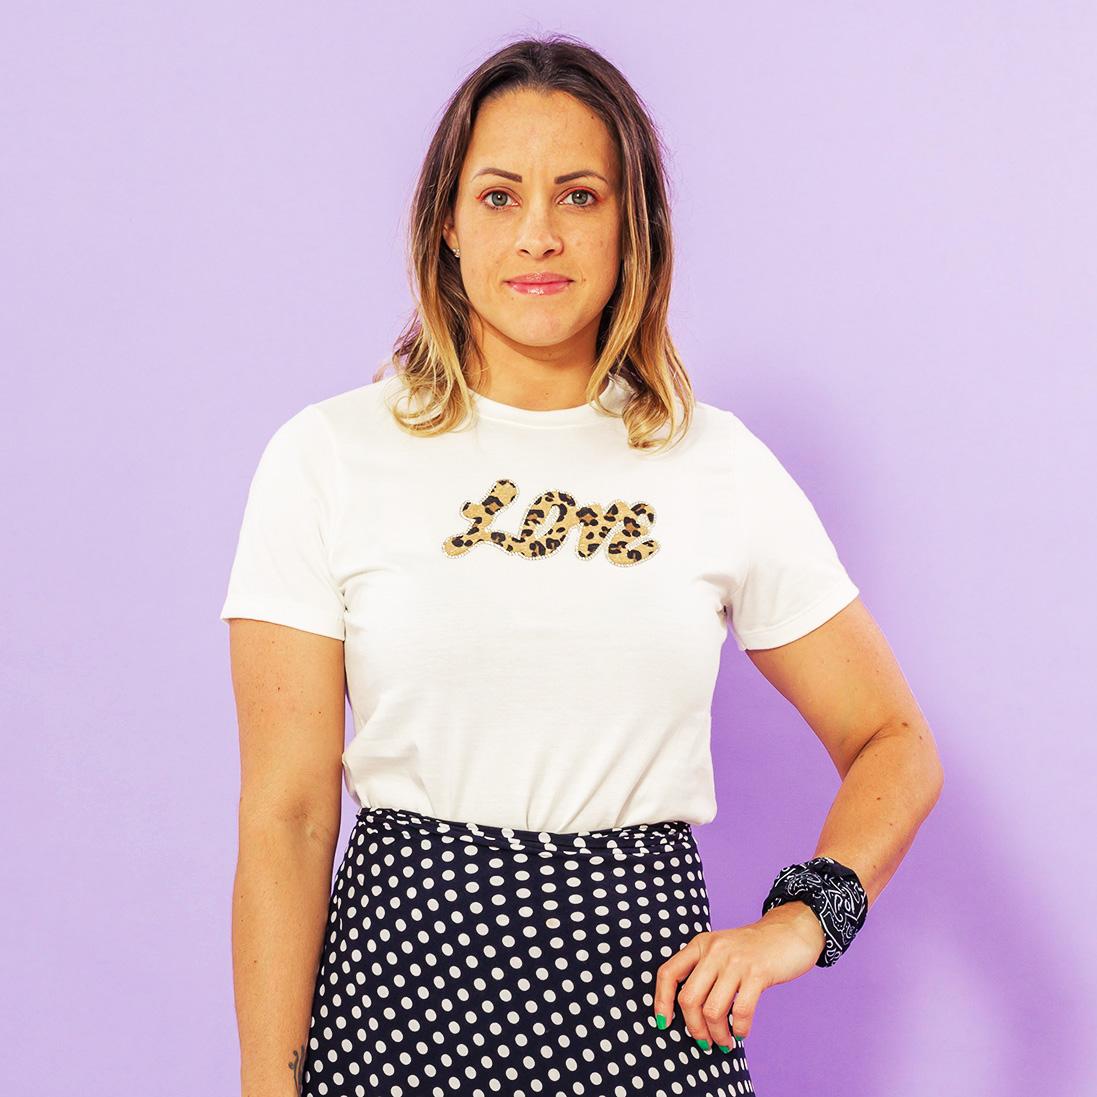 Combo 2 Peças - Tshirt Adulta + Tshirt Infantil Love Off White